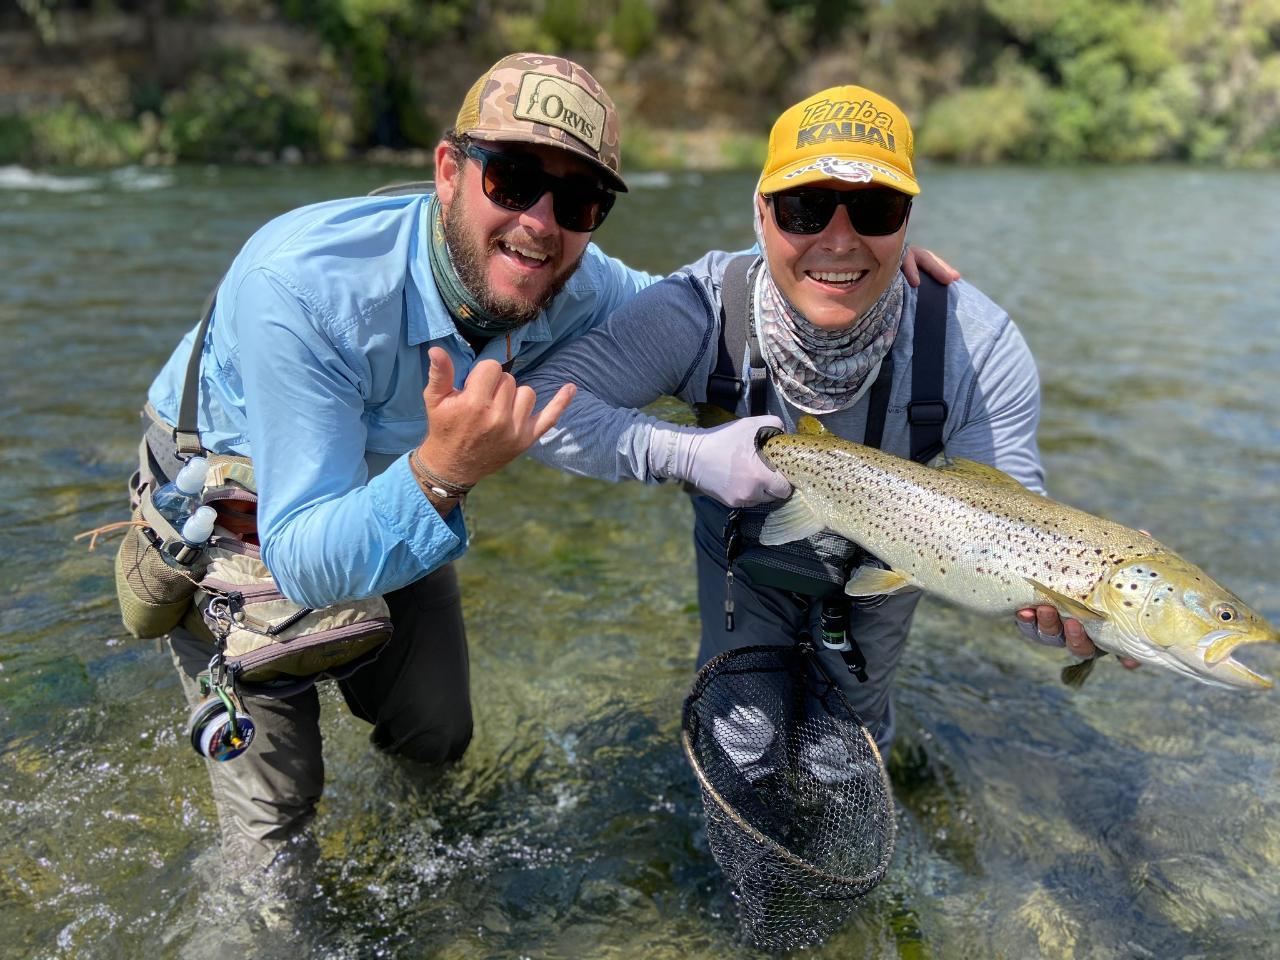 z Gift Voucher - 1/2 day Fly Fishing